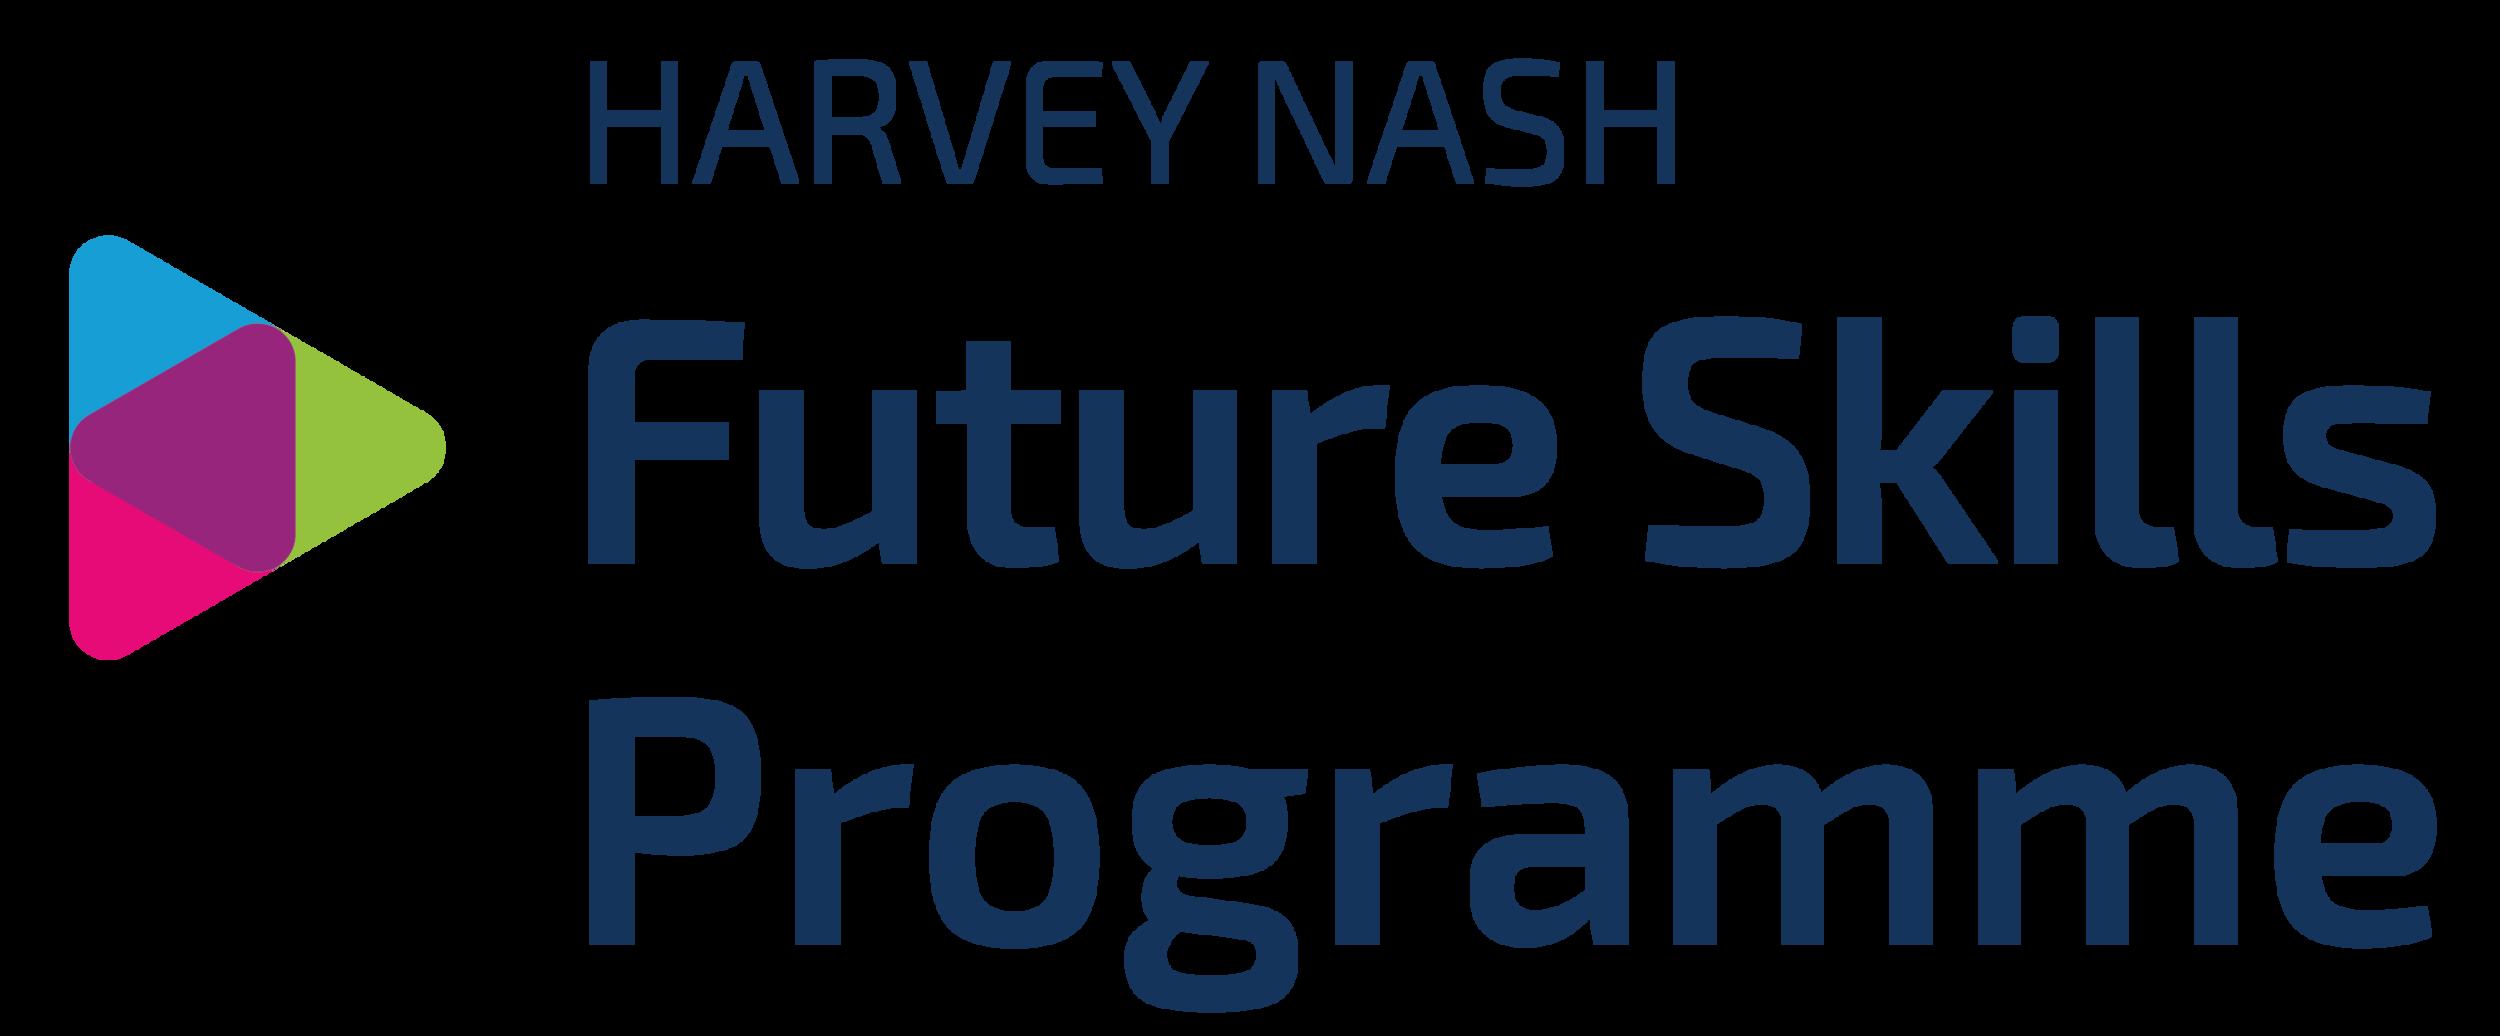 Harvey+Nash+future+skills+logo-01.png